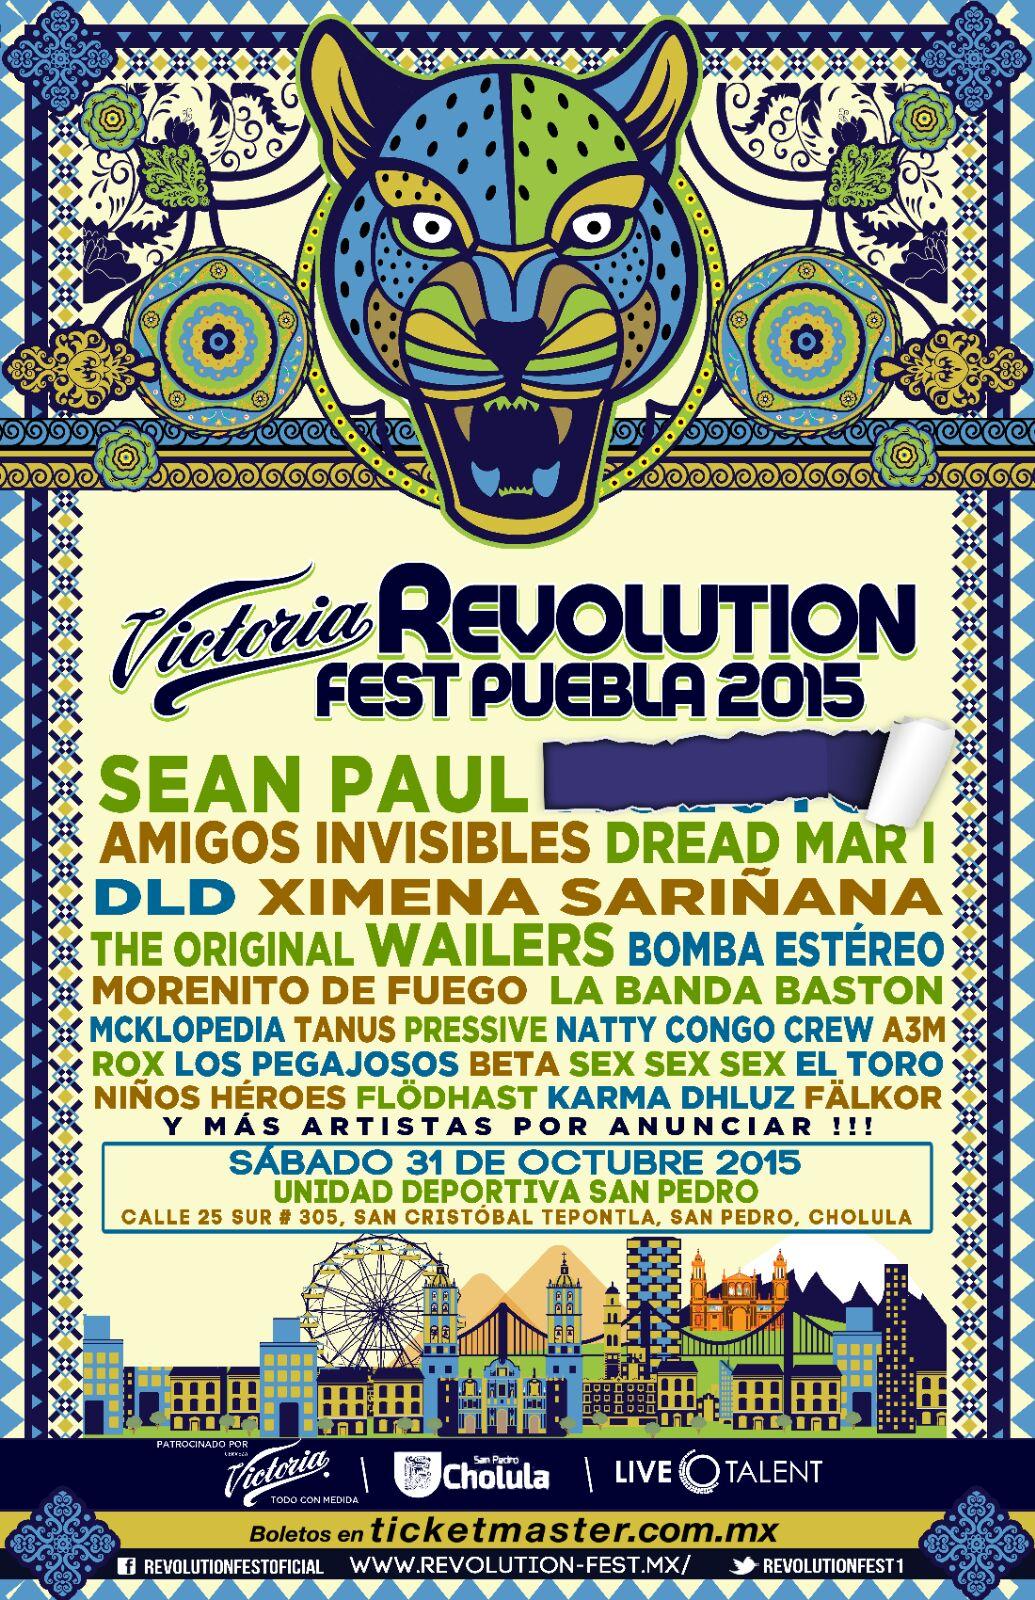 Revolution Fest Puebla Octubre 2015 Cartel